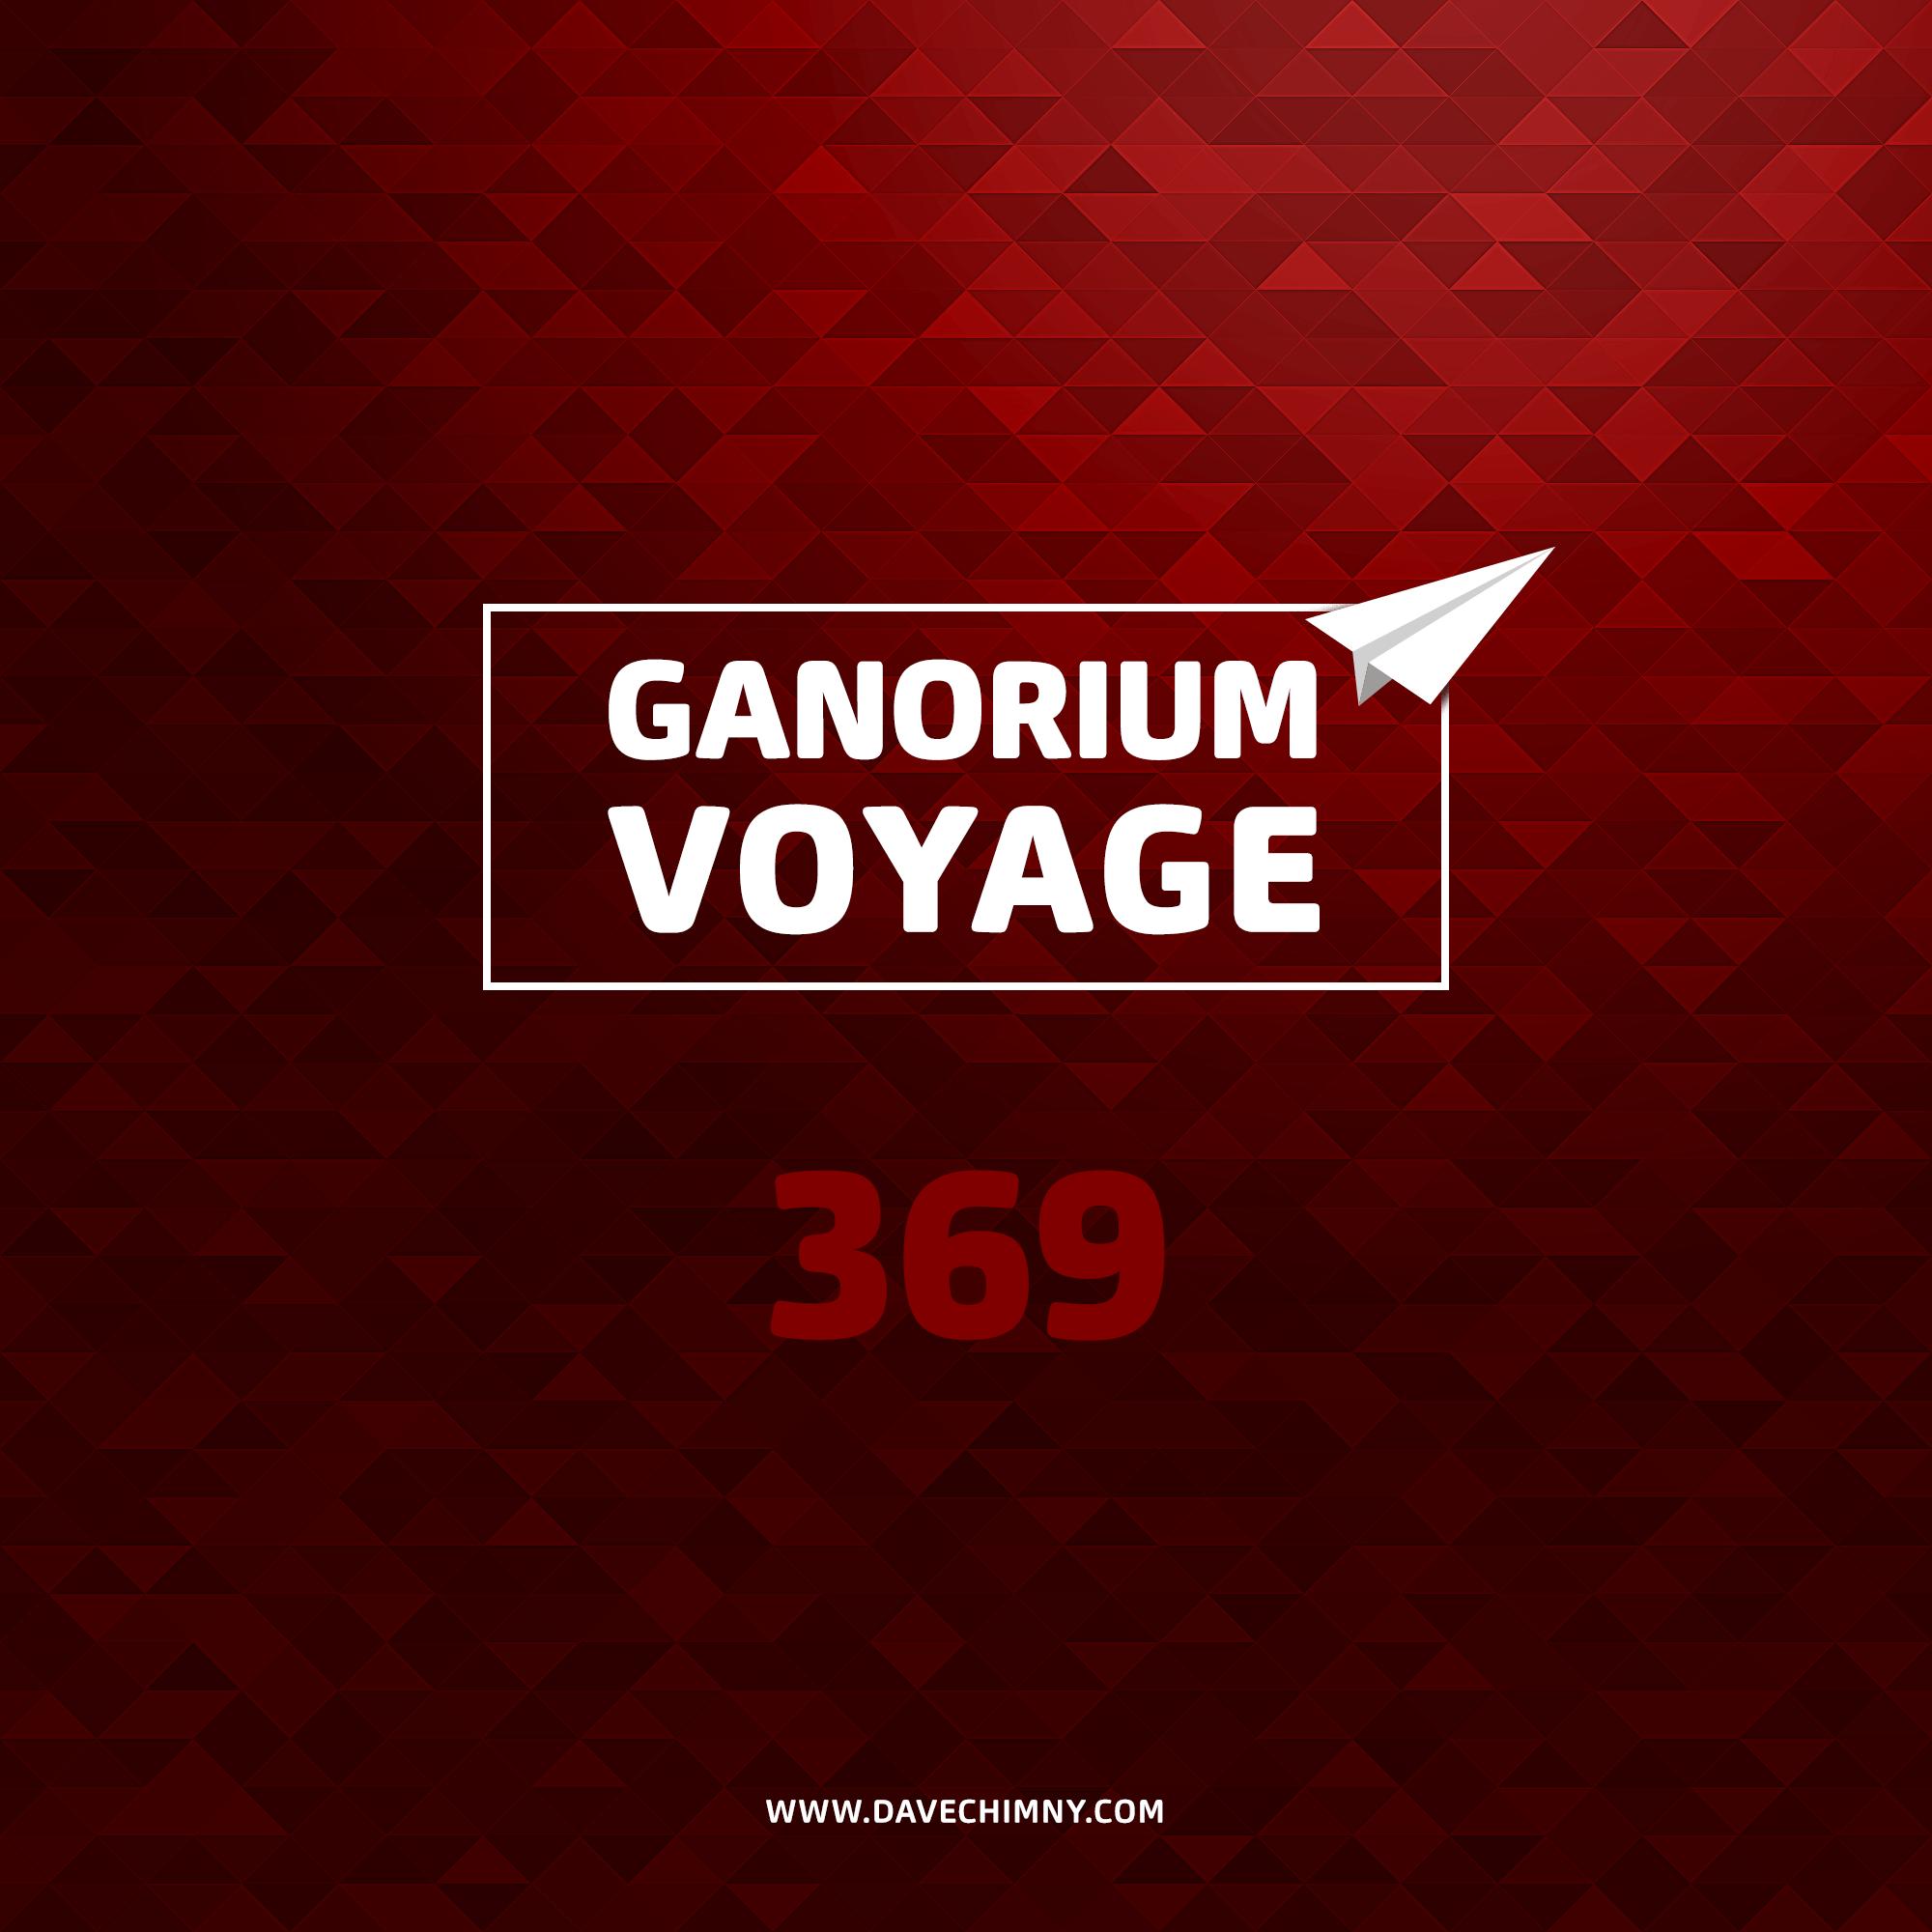 Dave Chimny – Ganorium Voyage 369